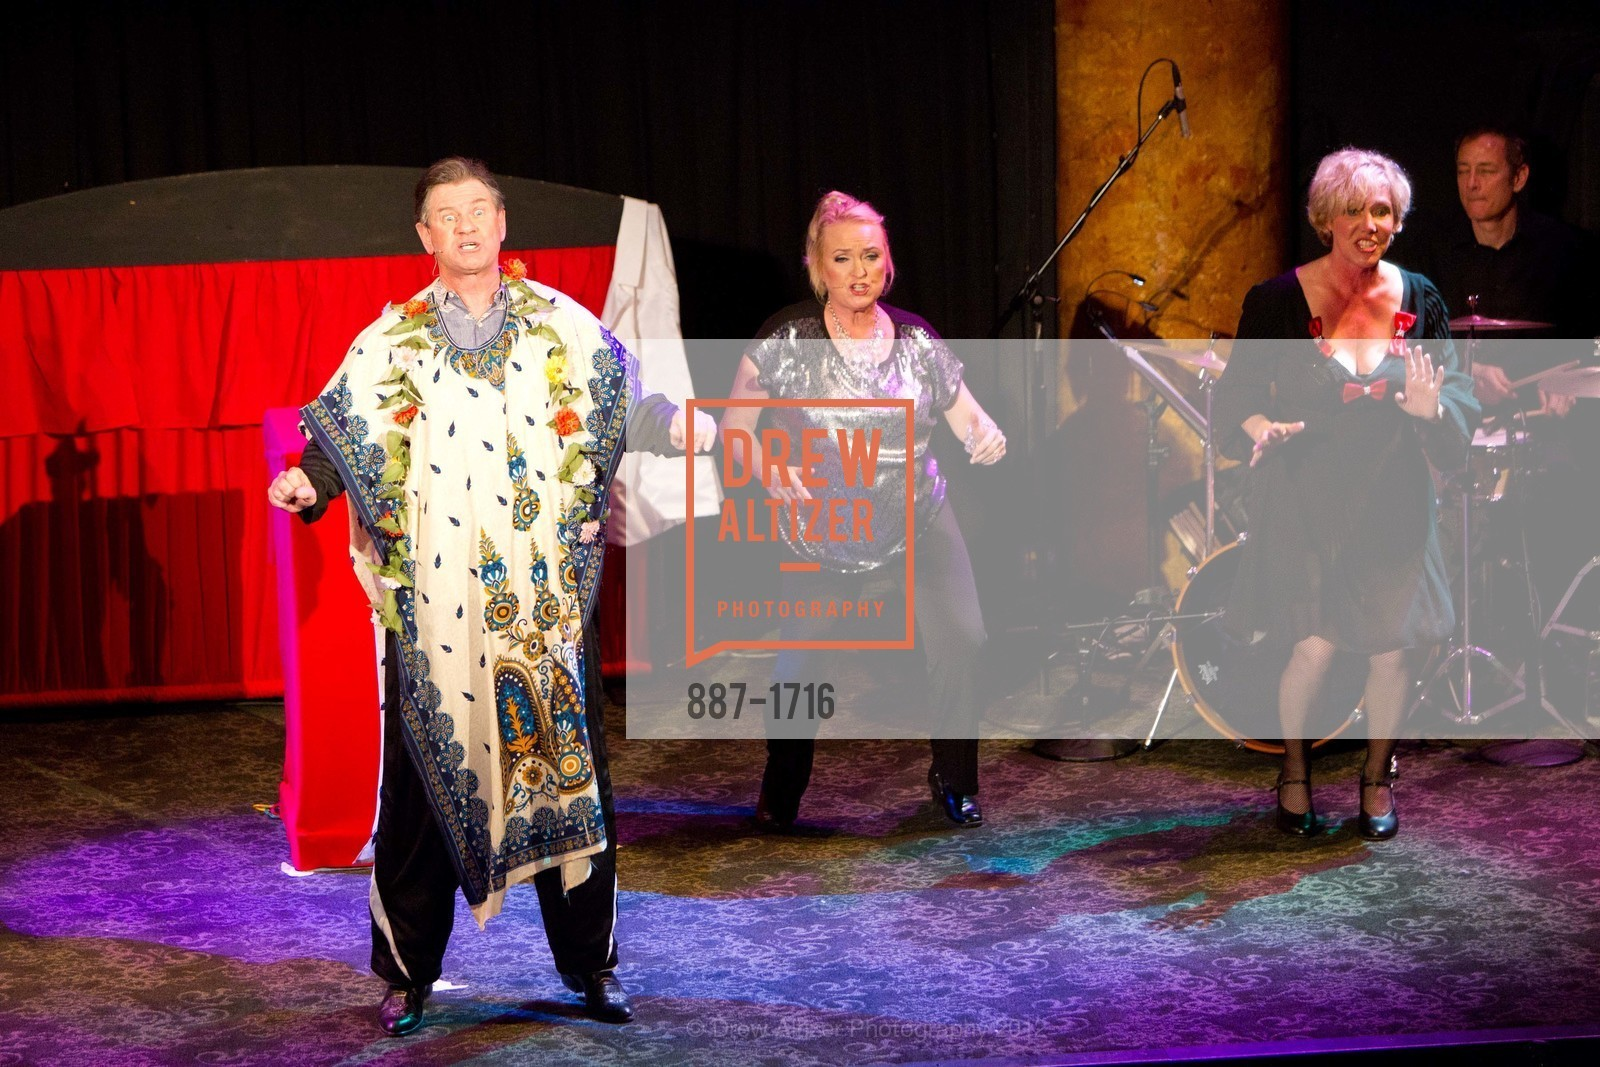 Performance, Photo #887-1716